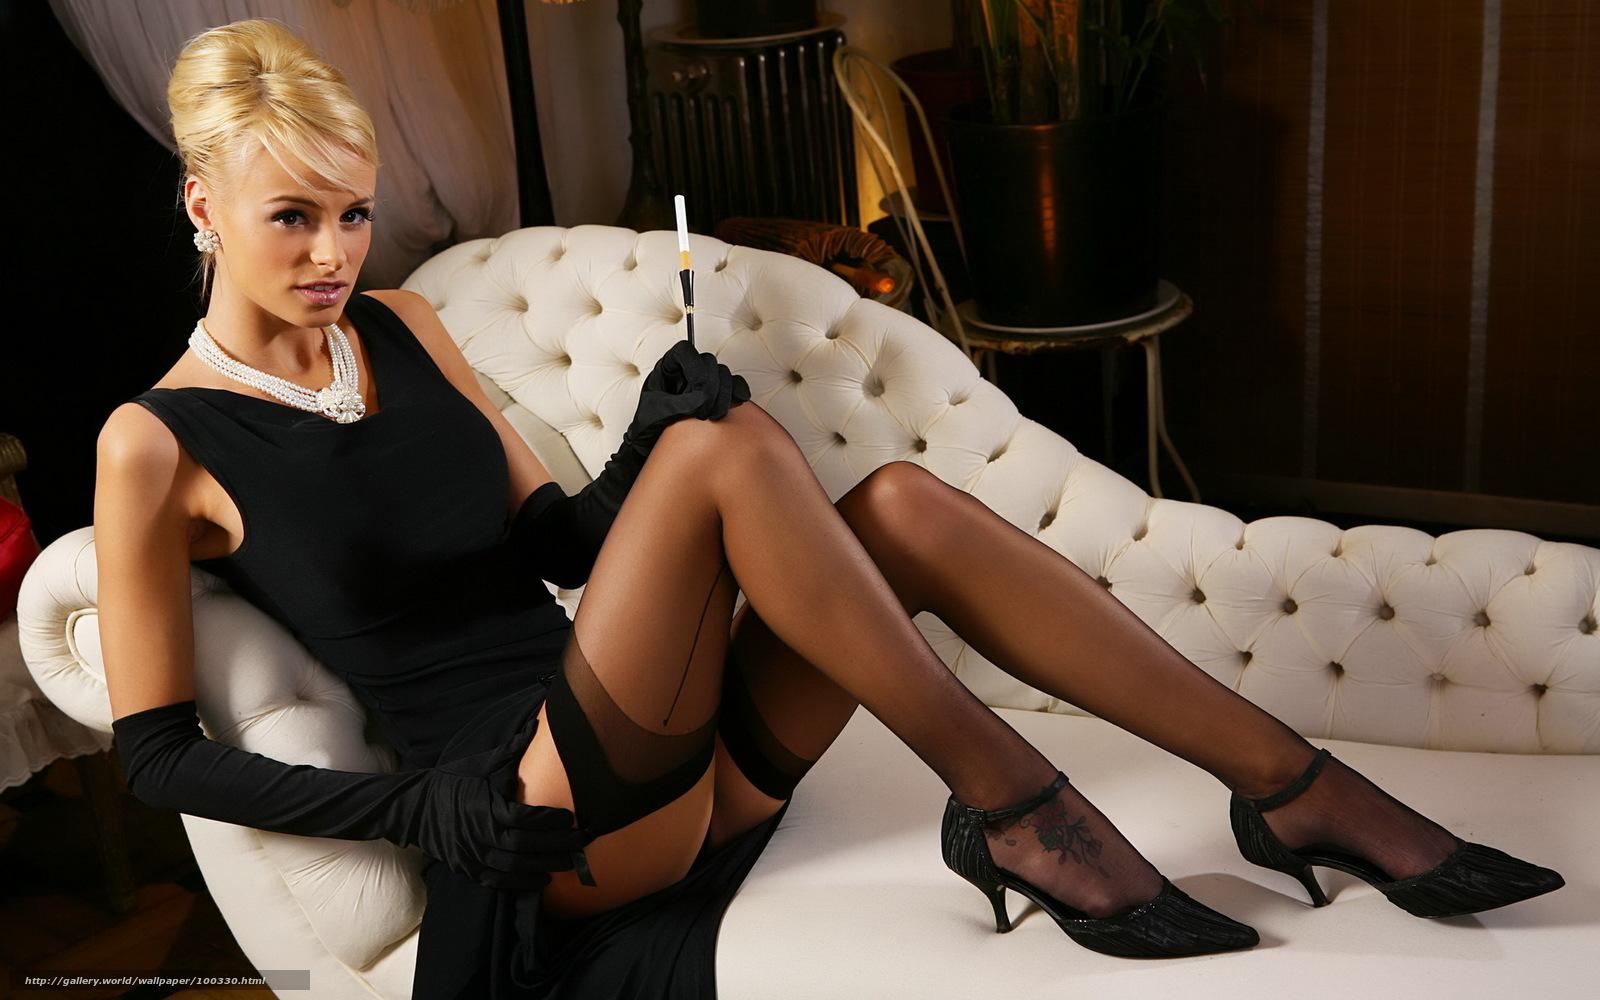 Фото госпожа в латексе с сигаретой 15 фотография